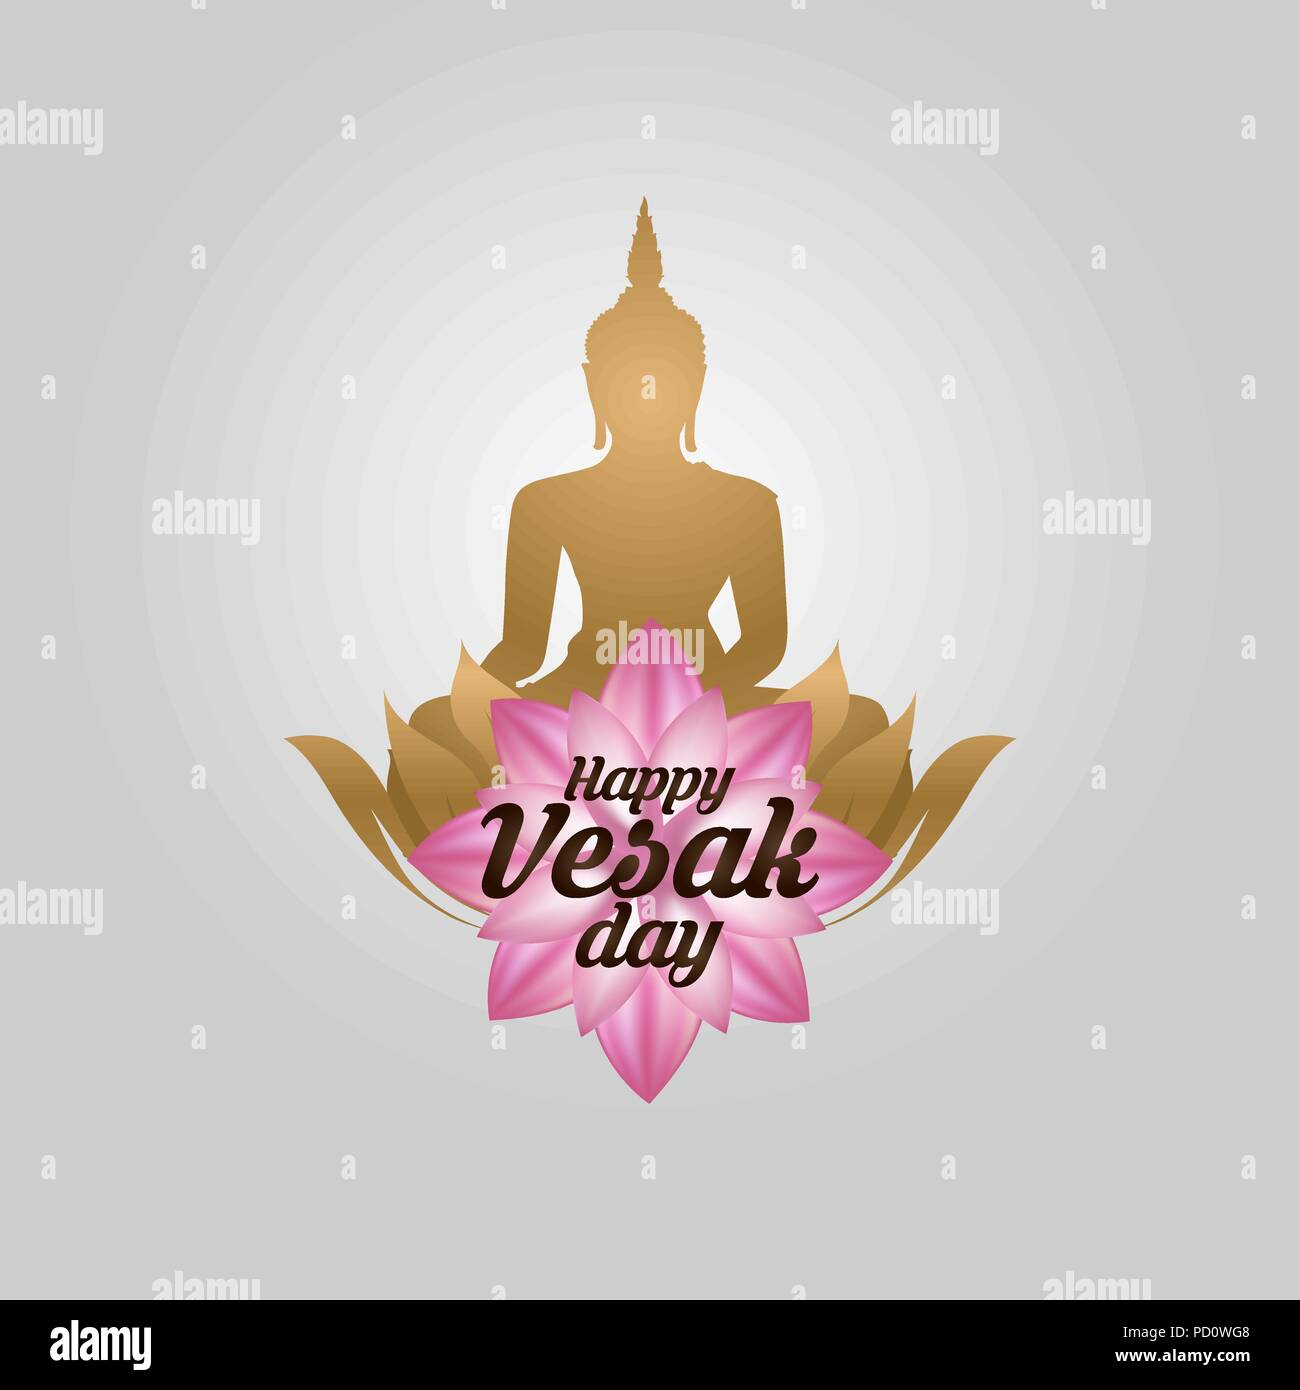 Buddha Purnima Festival Stock Photos & Buddha Purnima